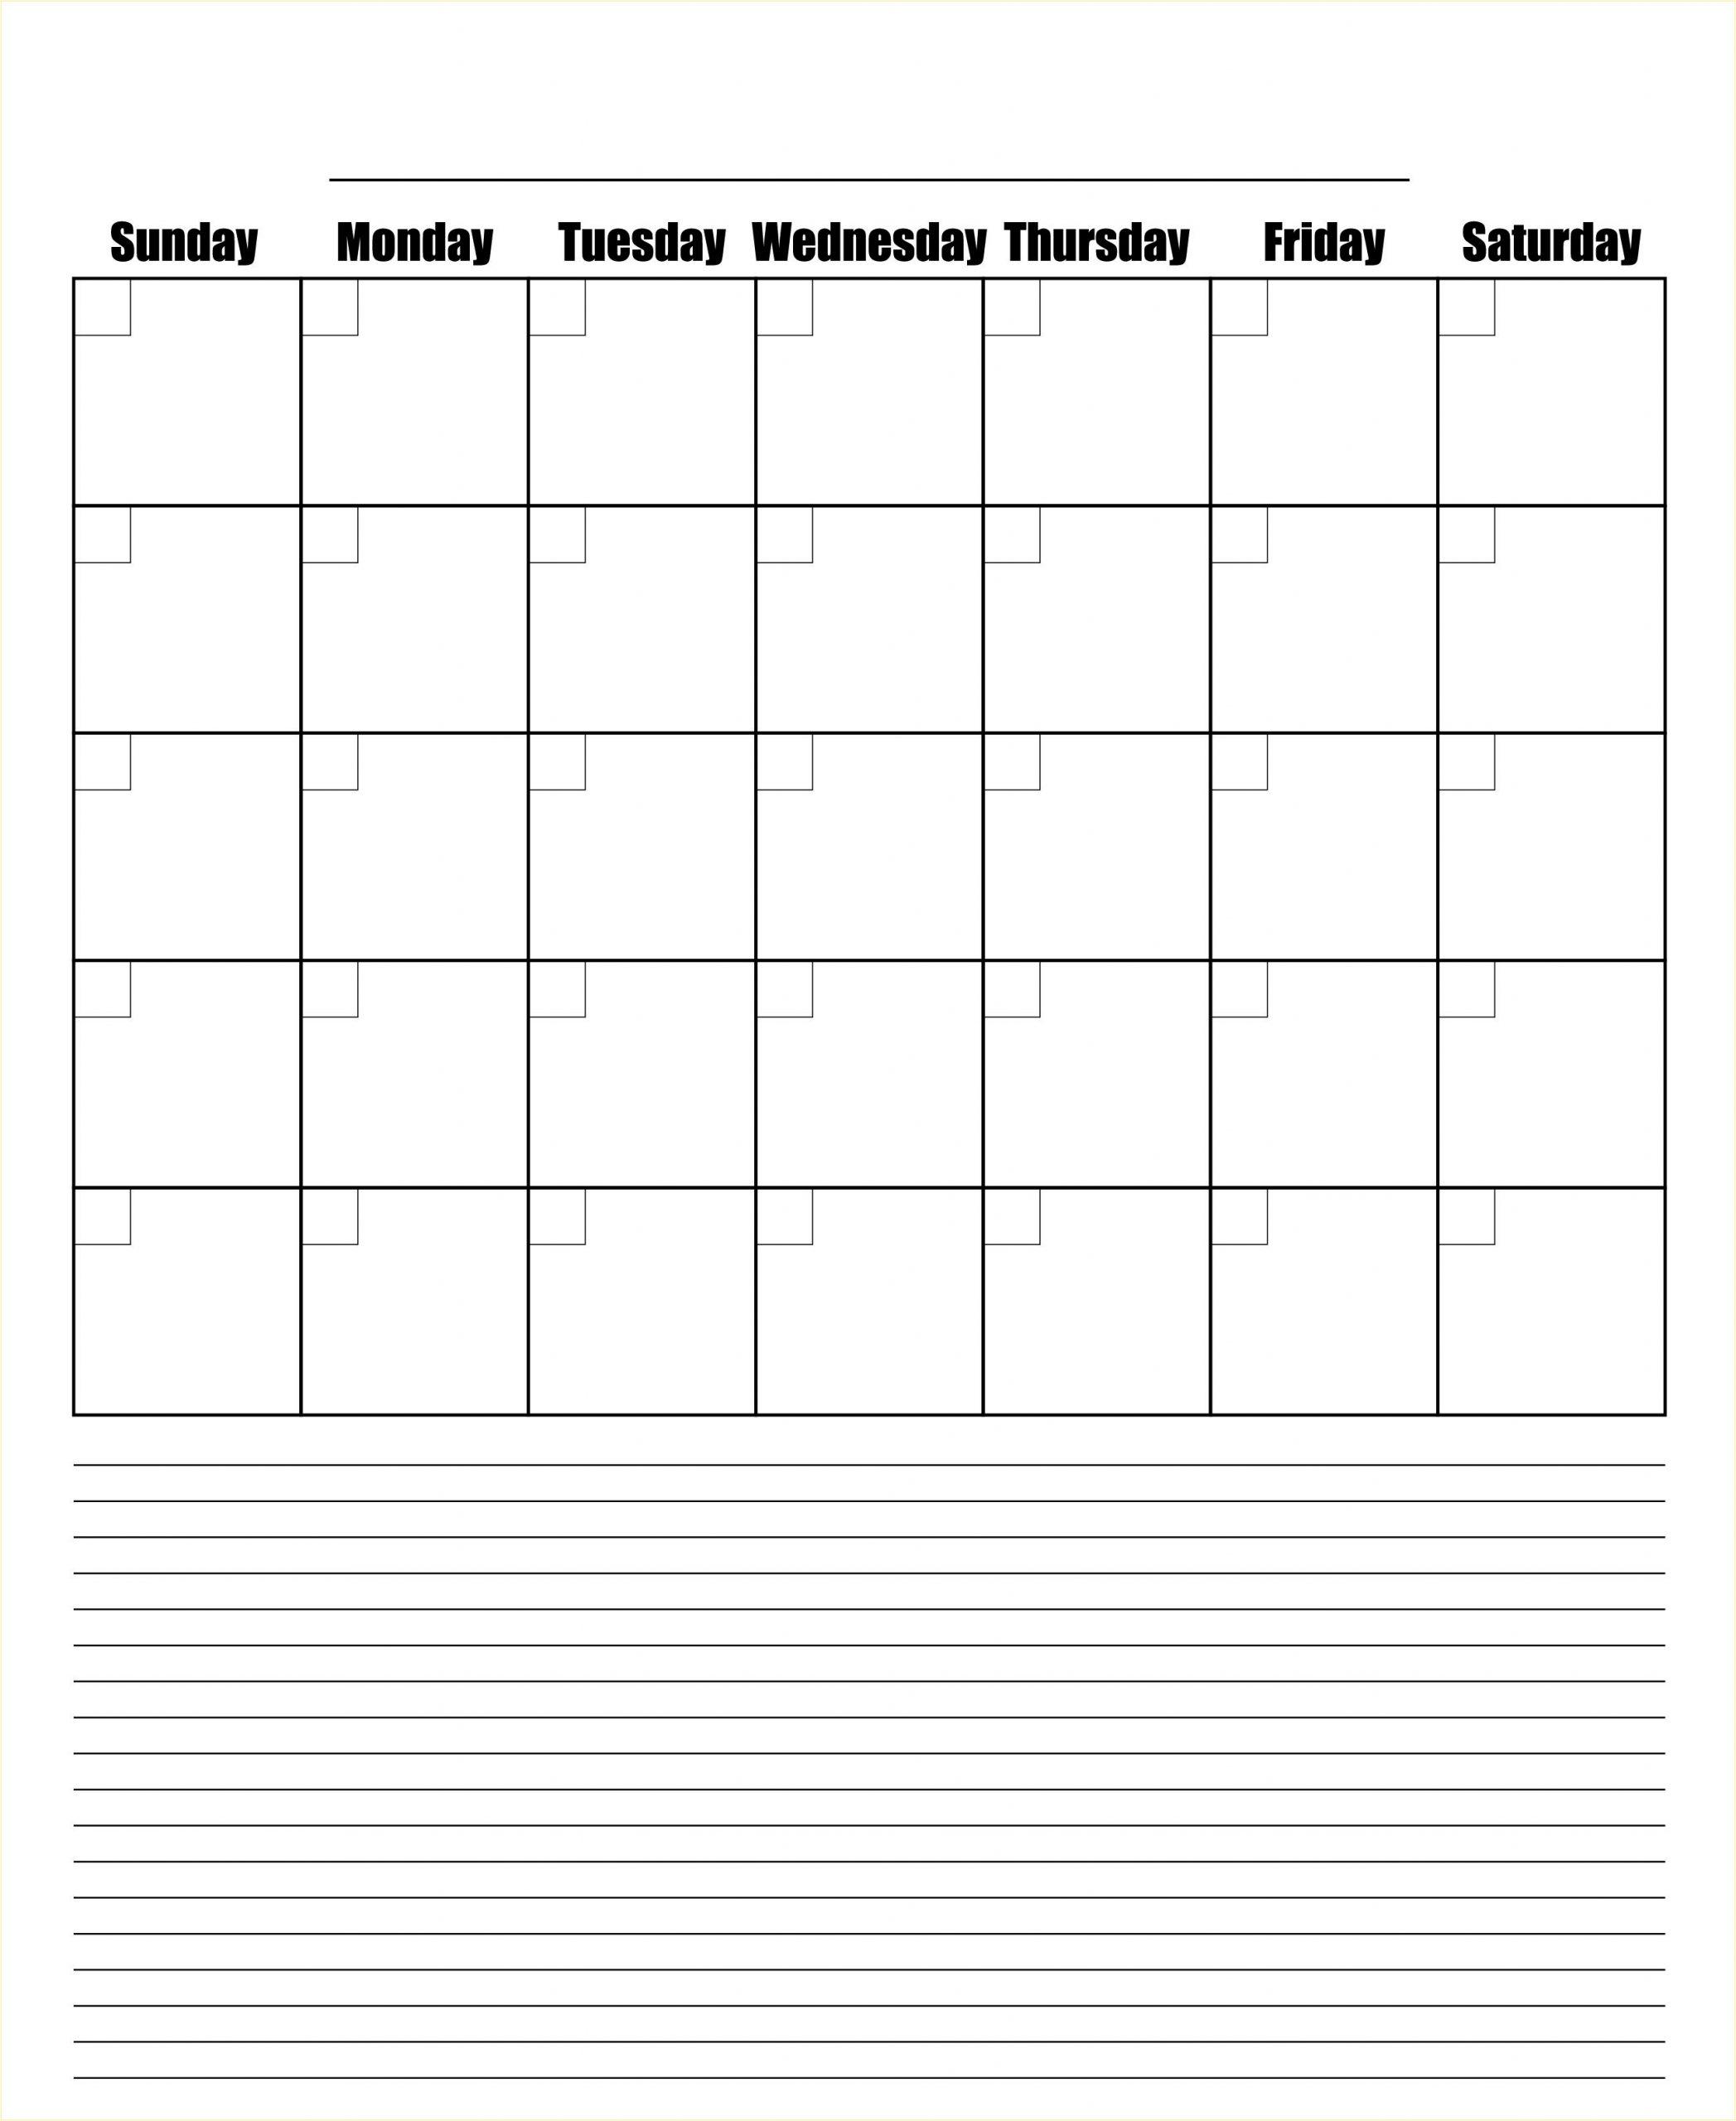 Printable Calendars By Month Big Box 2015 Autos Post